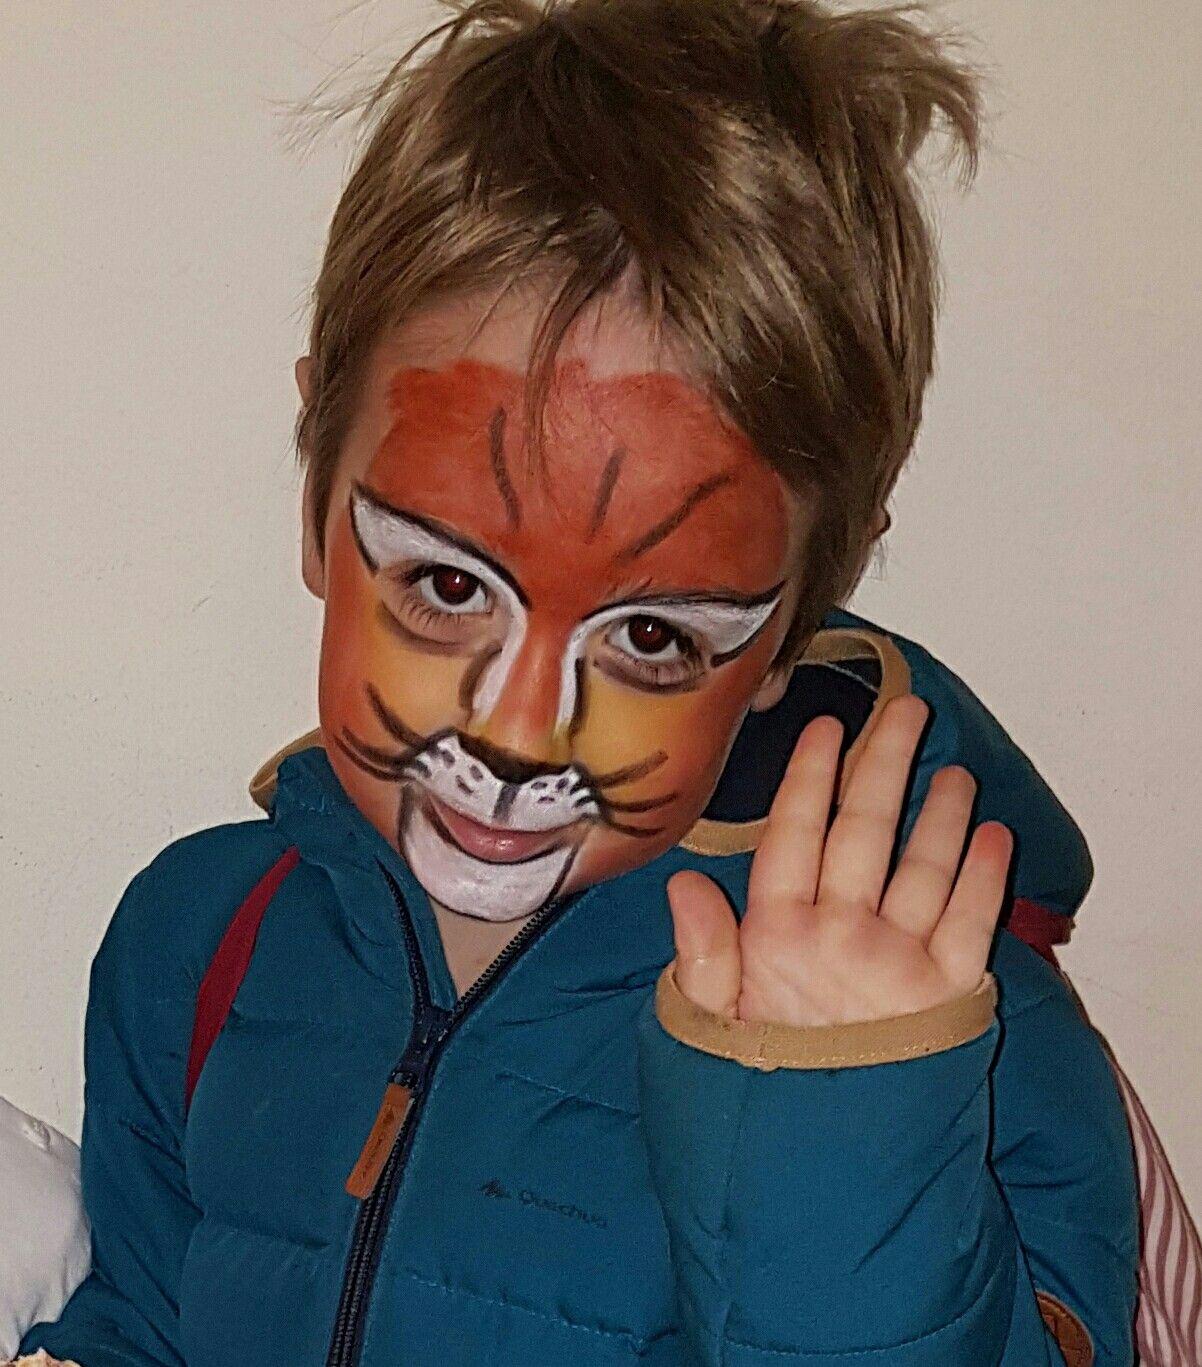 Lyon face painting